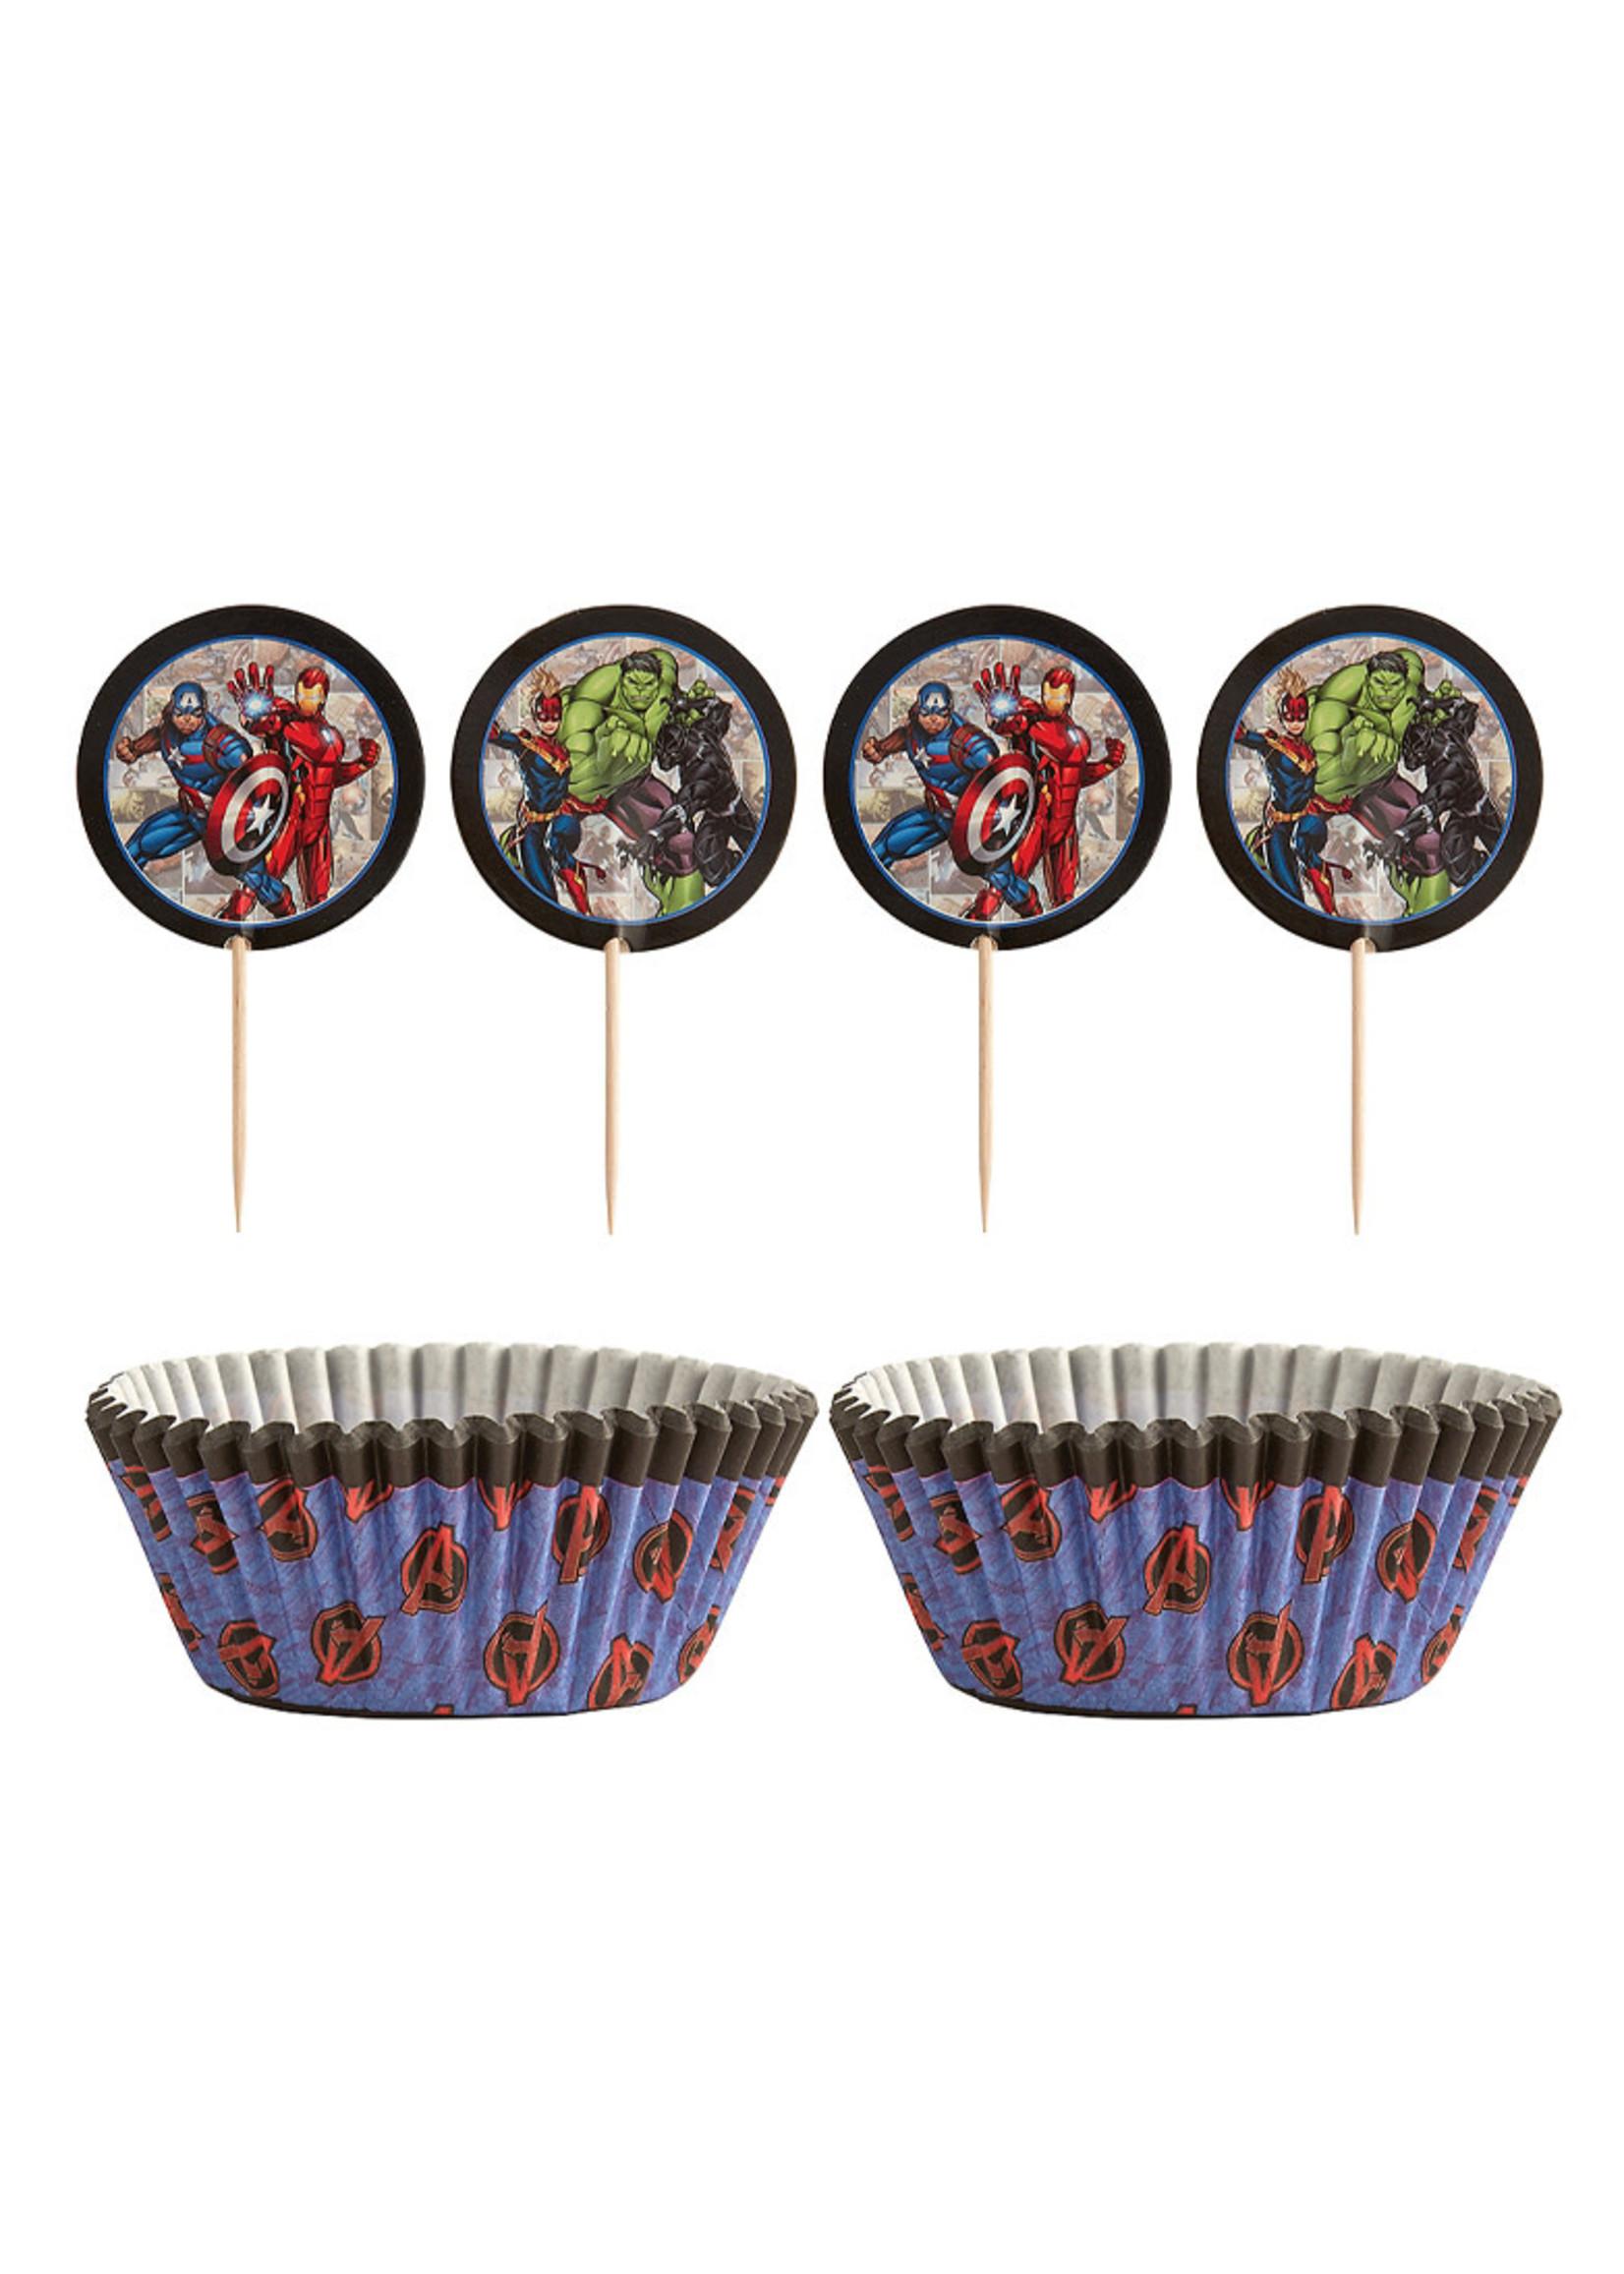 Marvel Powers Unite Cupcake Decorating Kit for 24